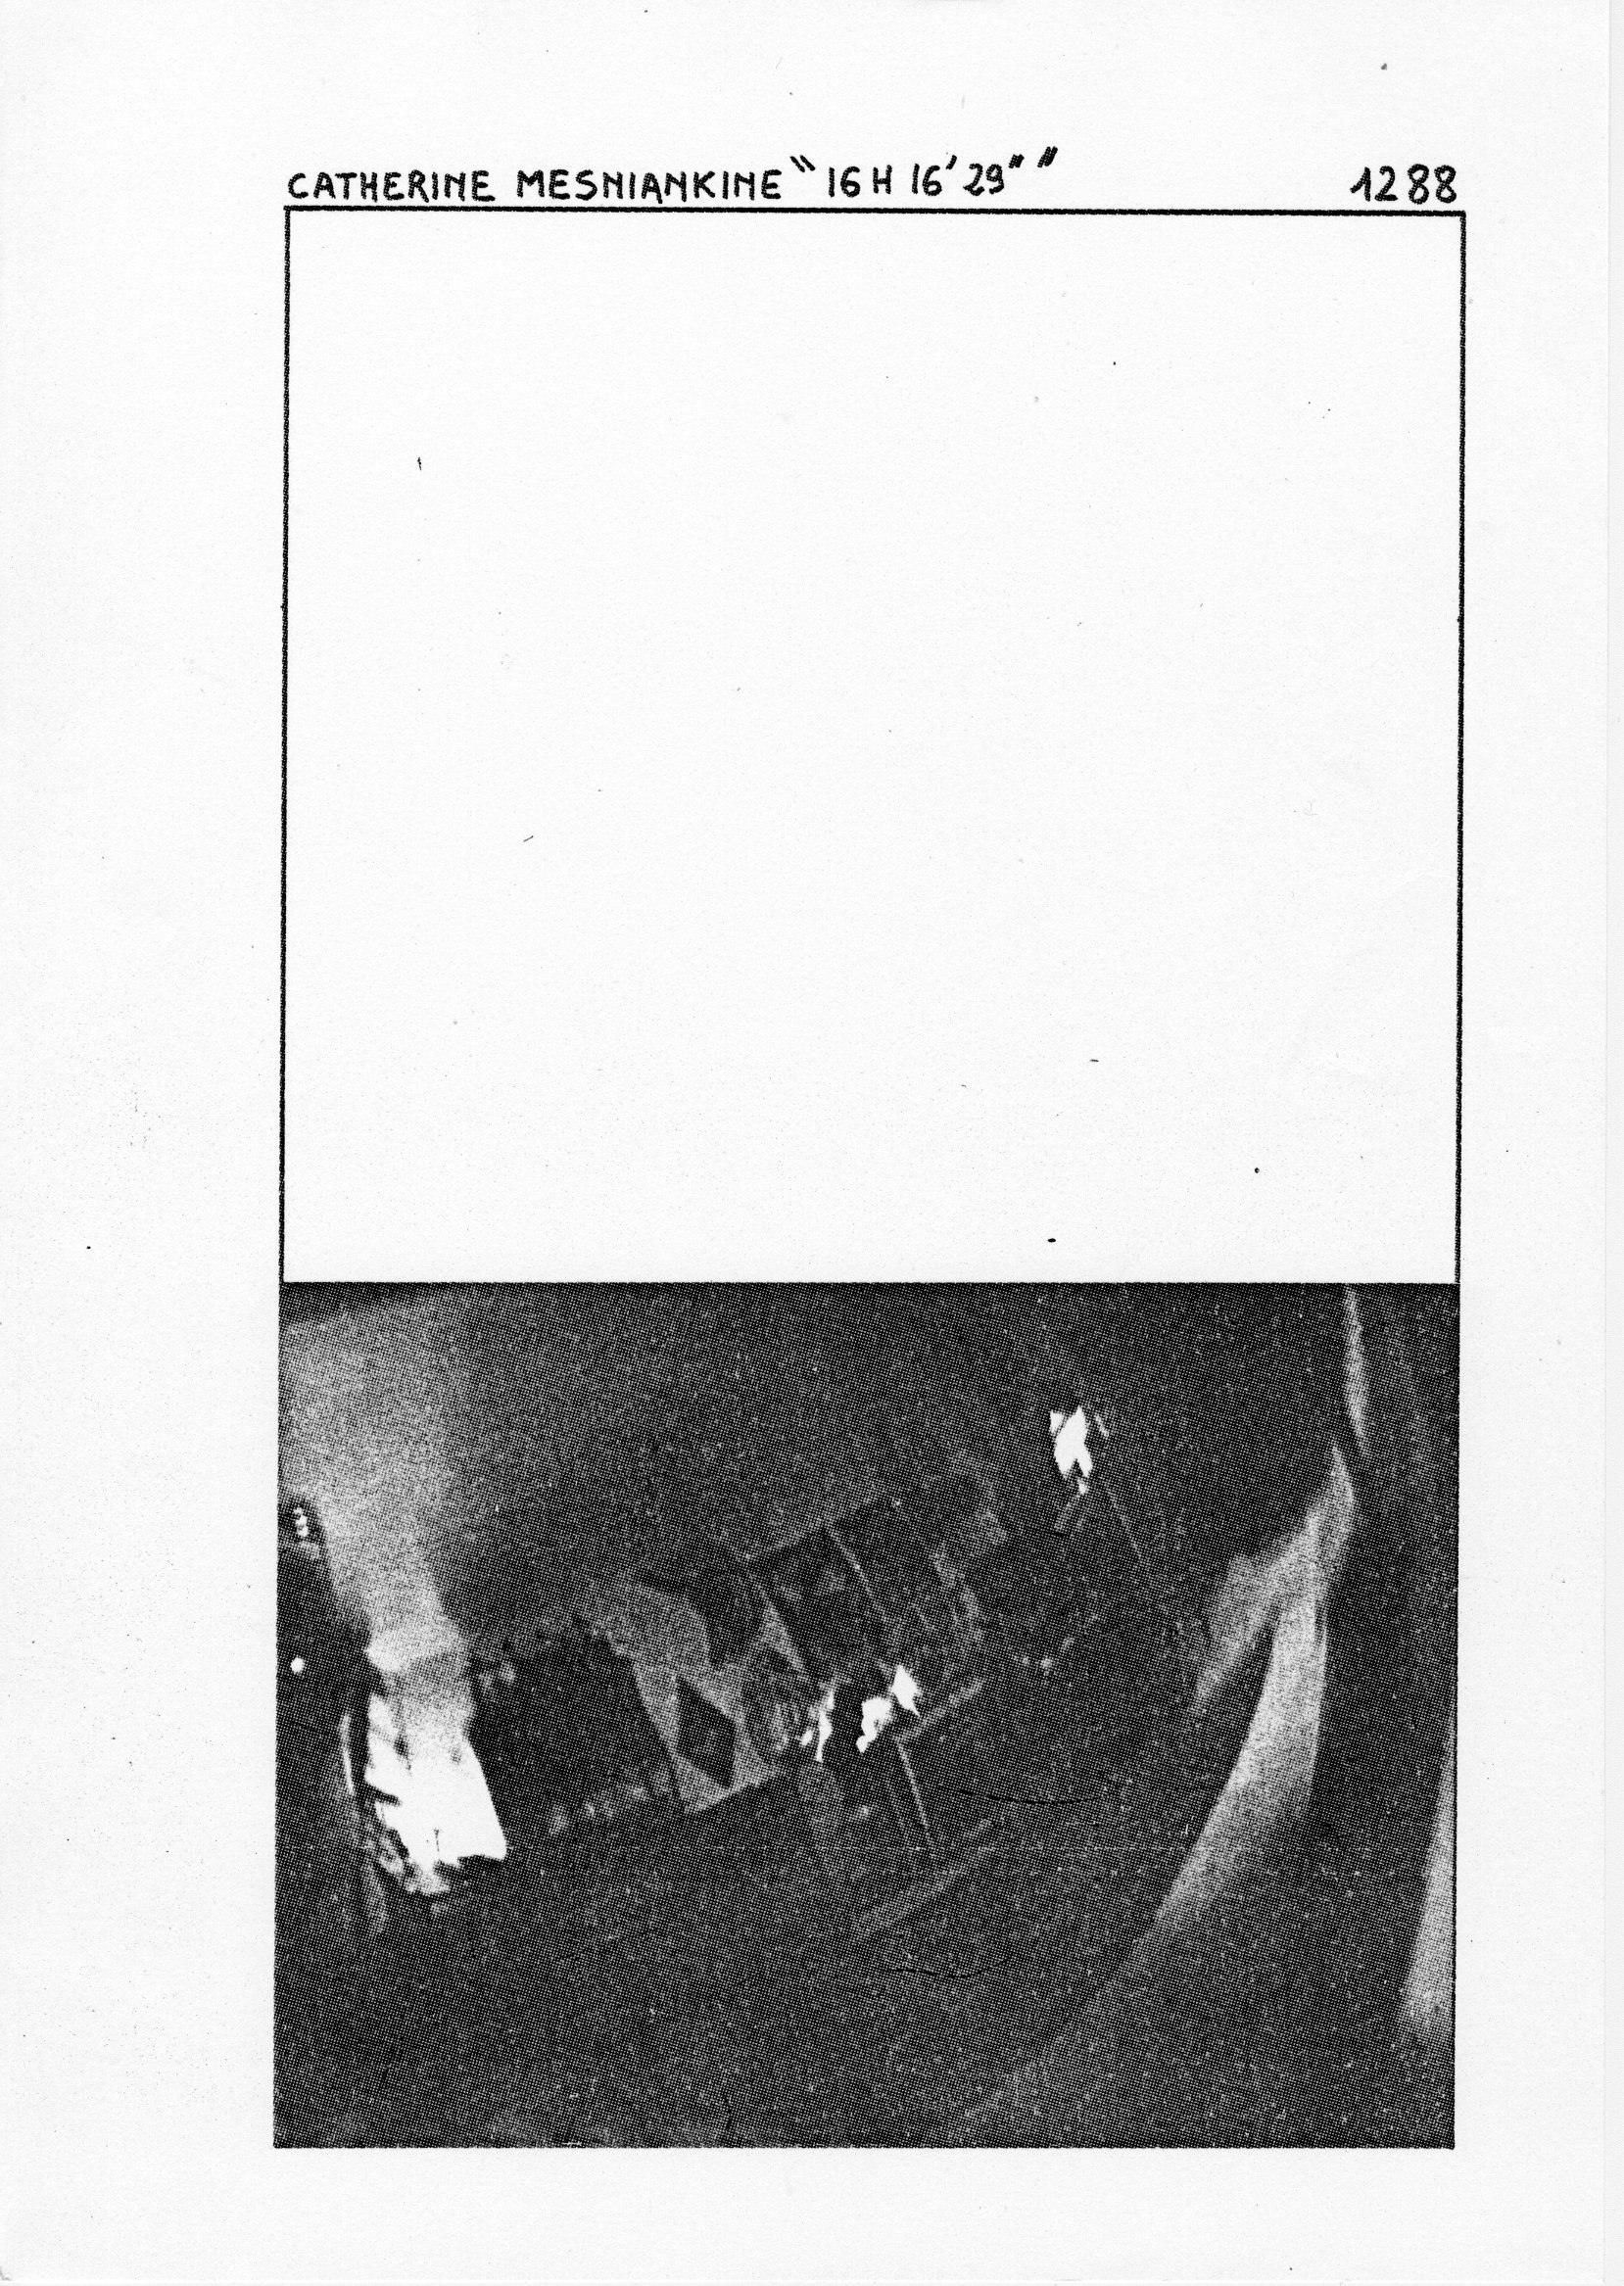 page 1288 C. MESNIANKINE 16 H 16' 29''